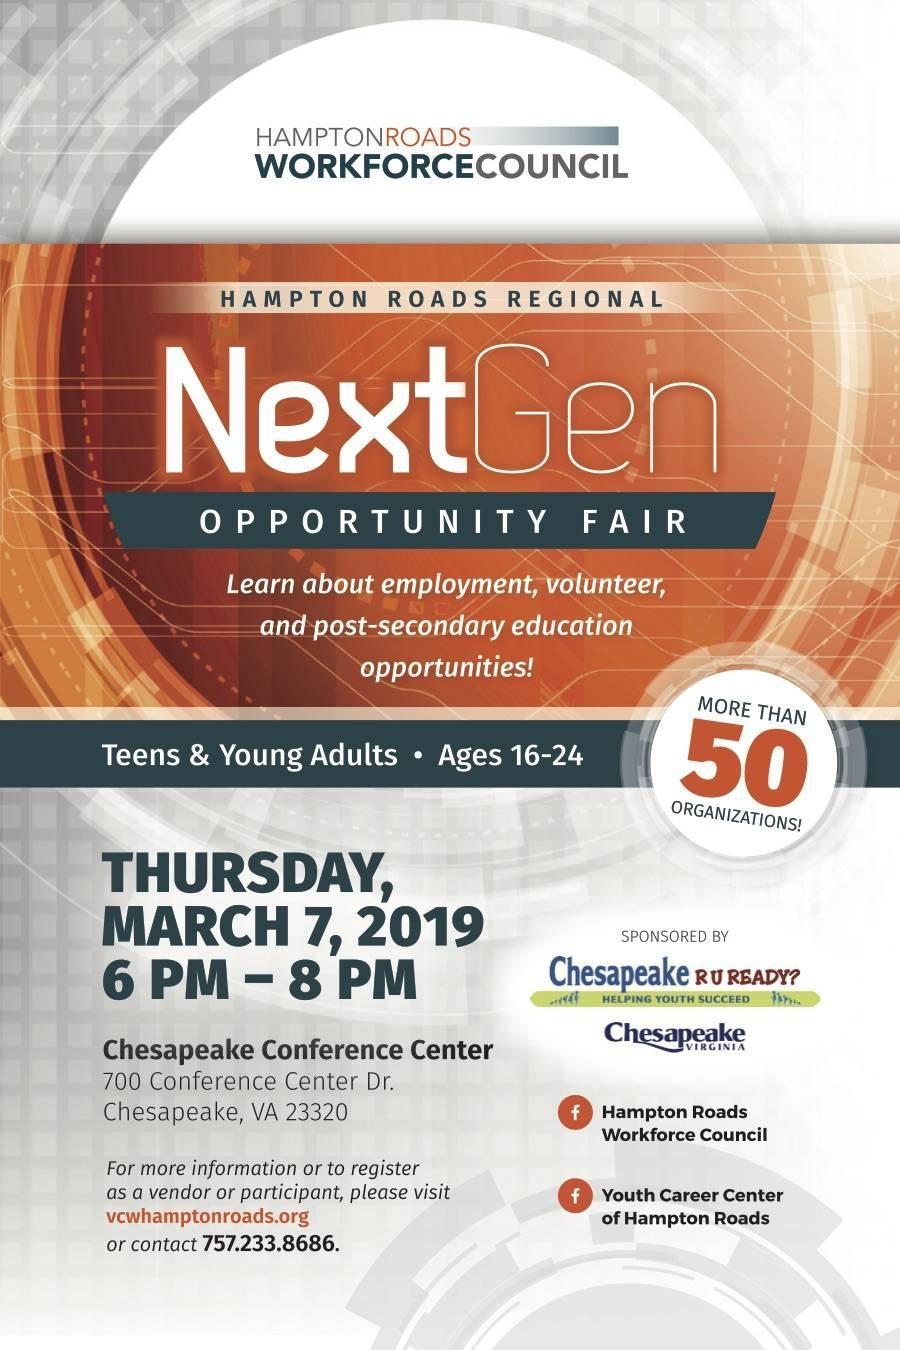 NextGen Opportunity Fair Flier